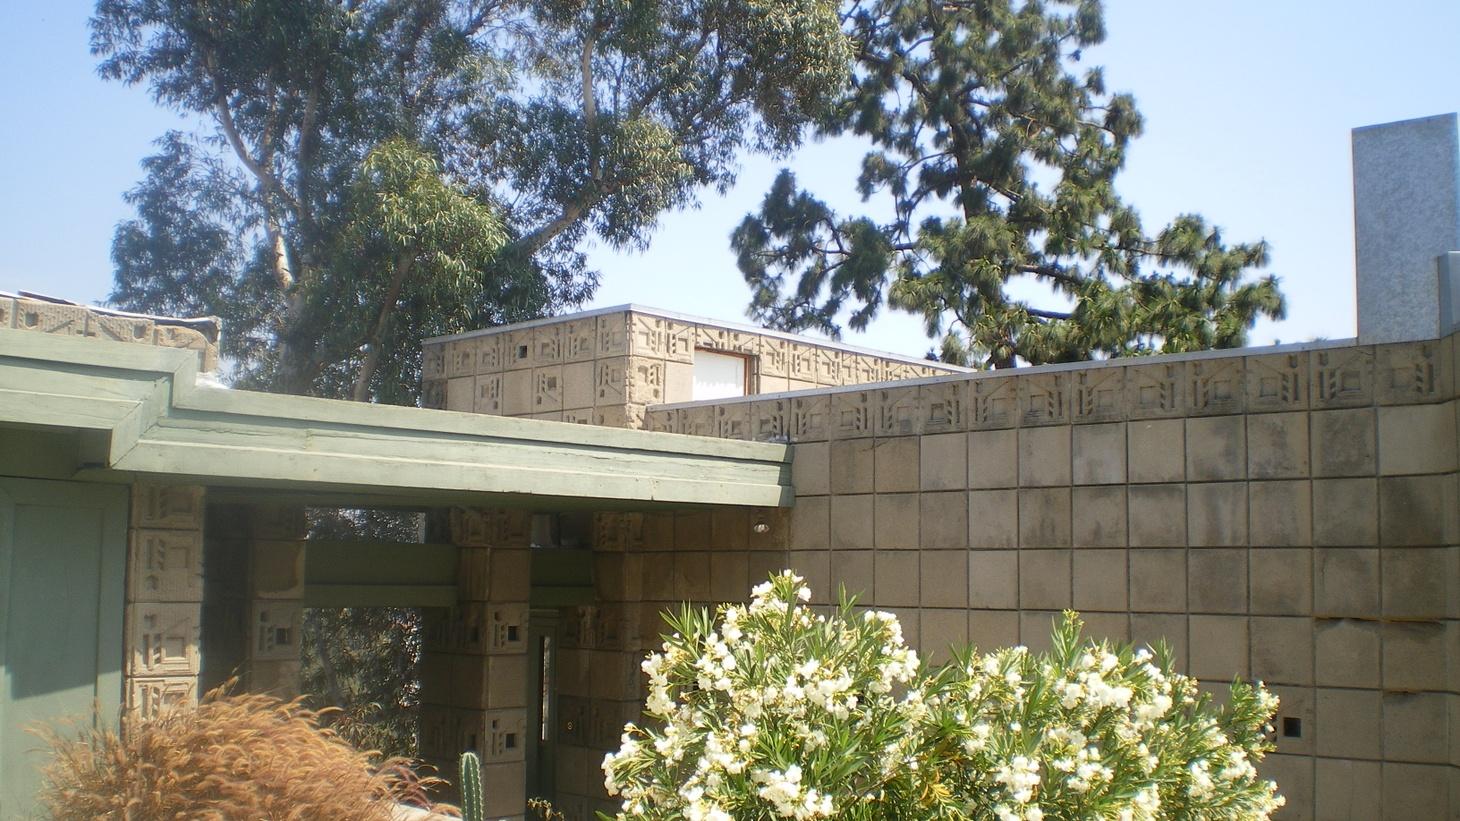 Frank Lloyd Wright's Samuel Freeman House